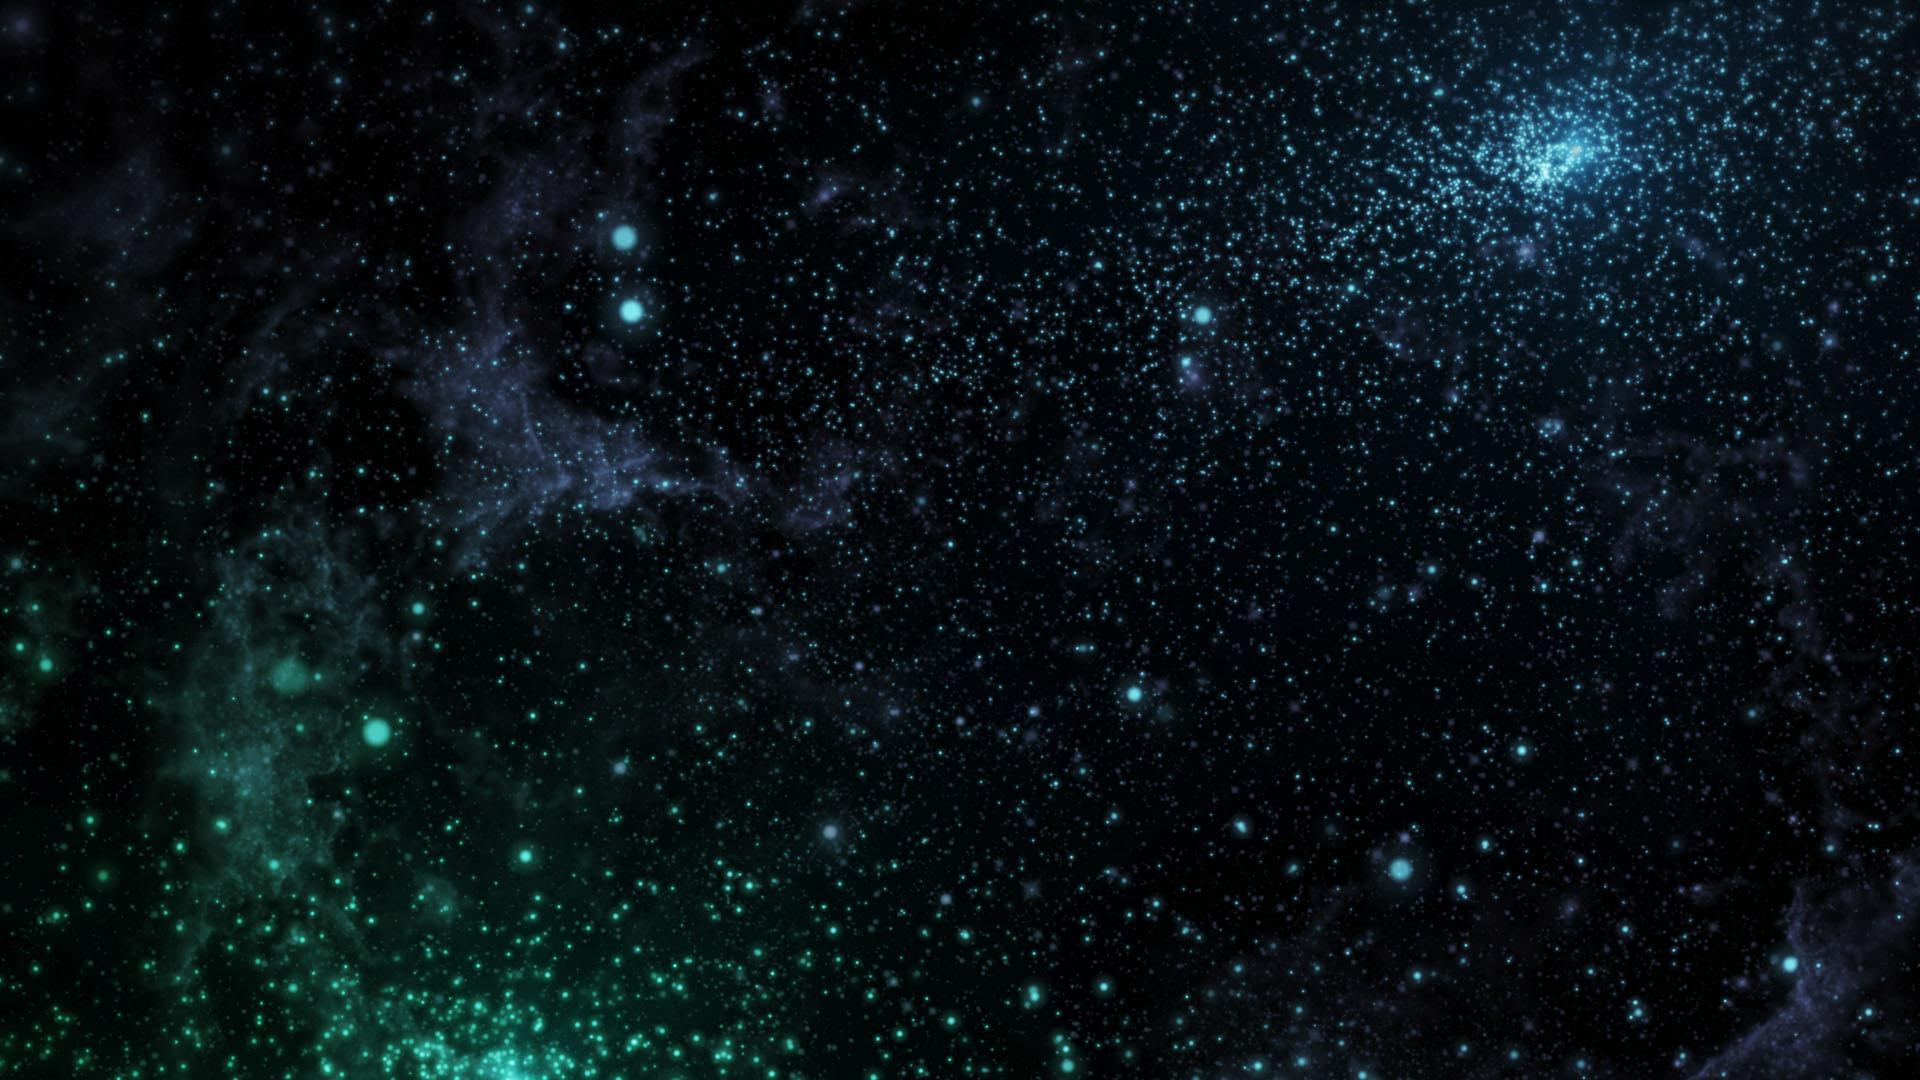 Deep Space Wallpaper   Widescreen HD Wallpapers 1920x1080